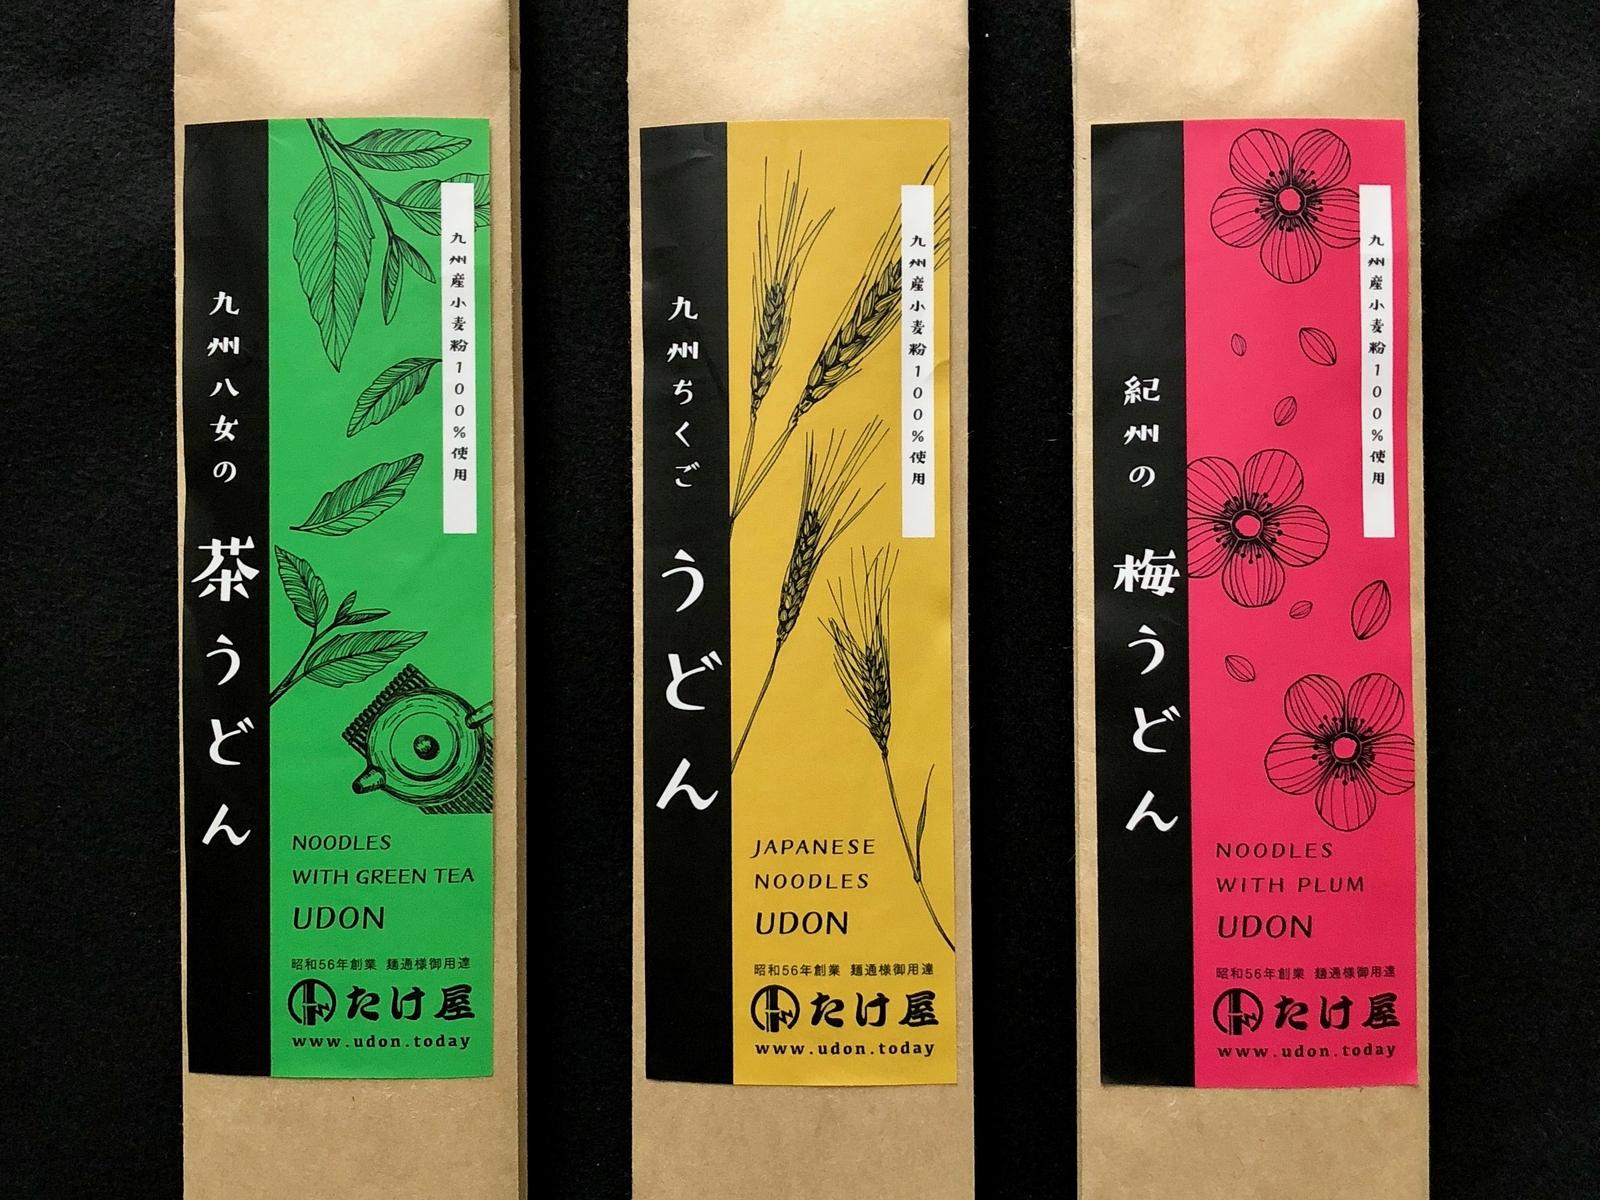 Food Expo Kyushu2018 in 福岡国際センター